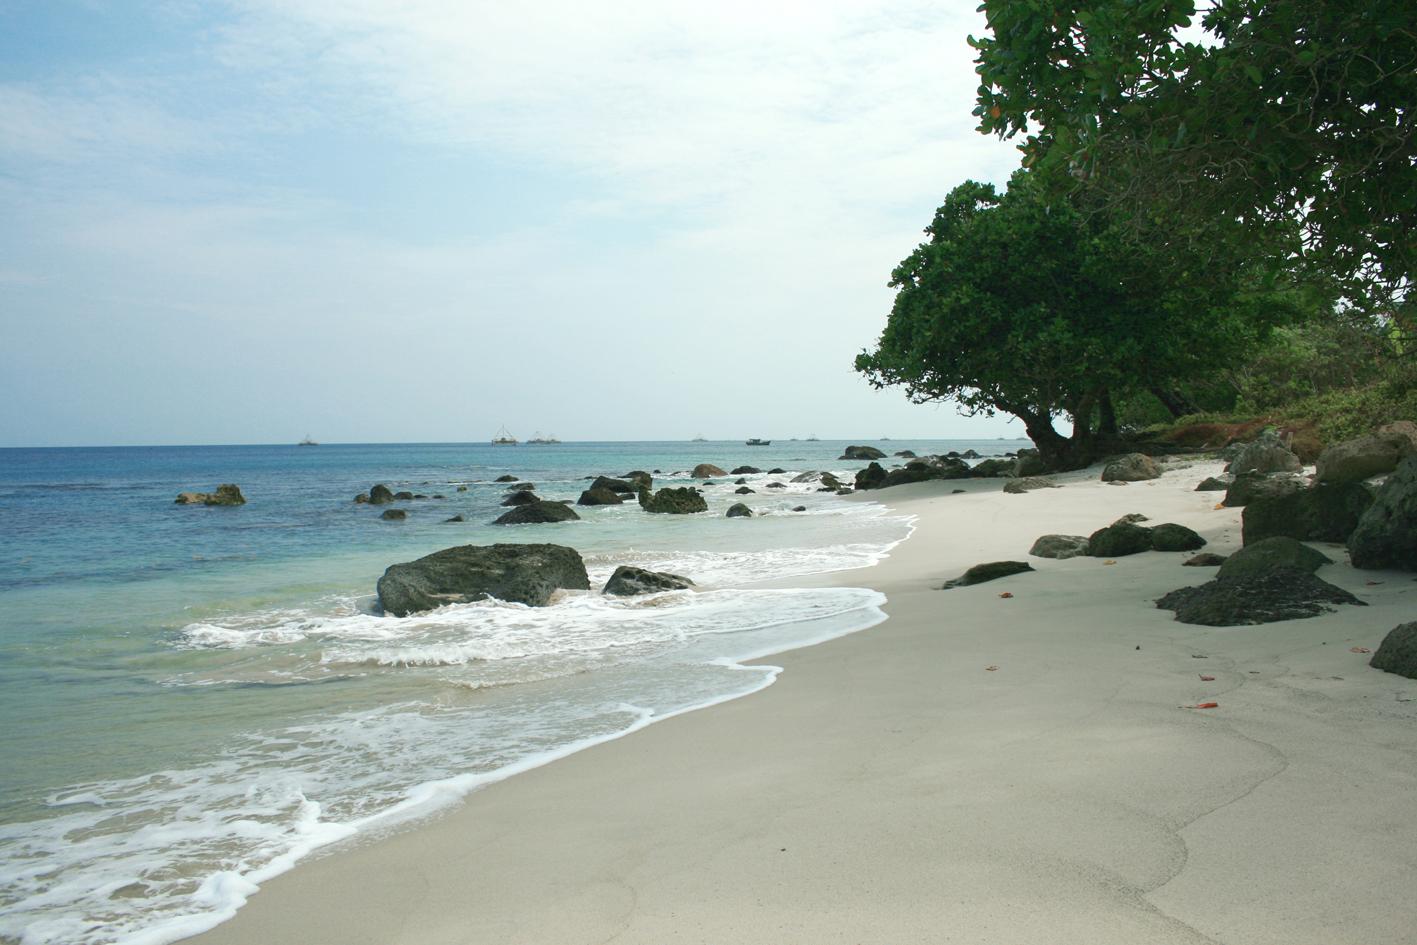 Pantai Tanjung Lesung Perawan Barat Pulau Jawa Umang Kab Pandeglang